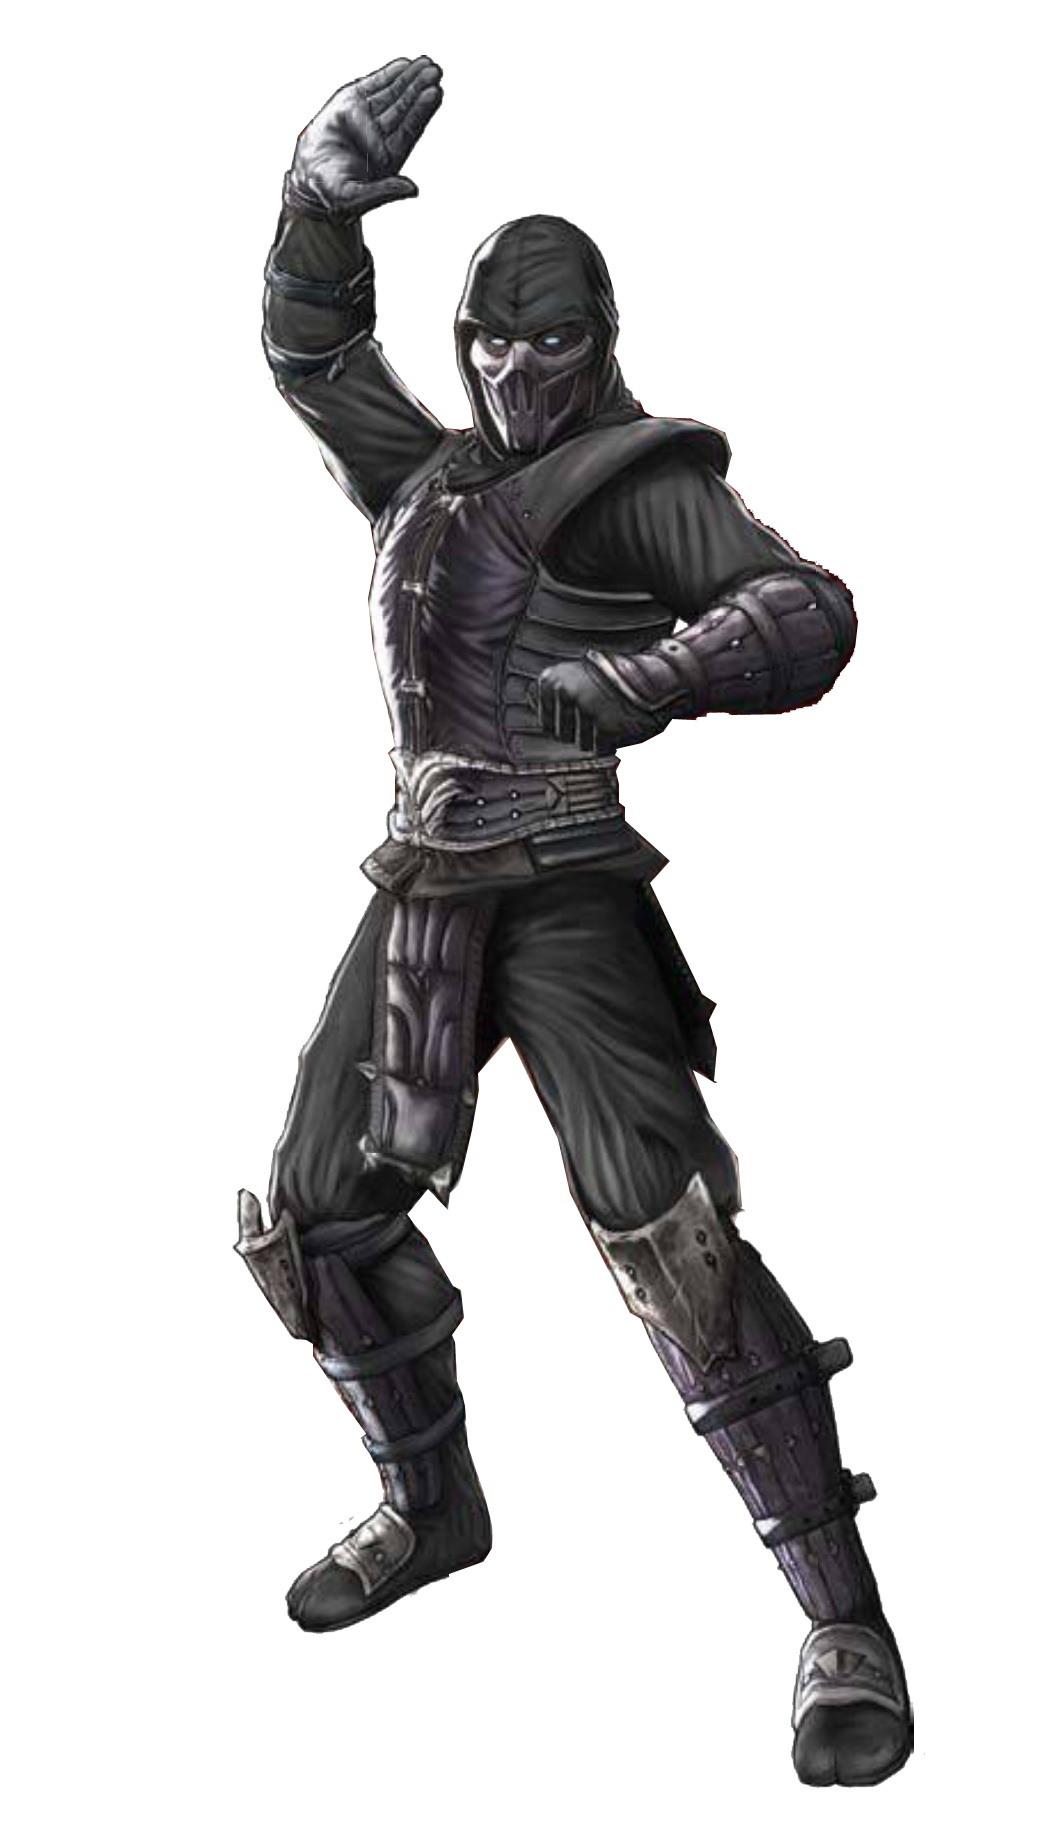 Bi Han The Mortal Kombat Wiki Noob Saibot Sub Zero Mortal Kombat Mortal Kombat